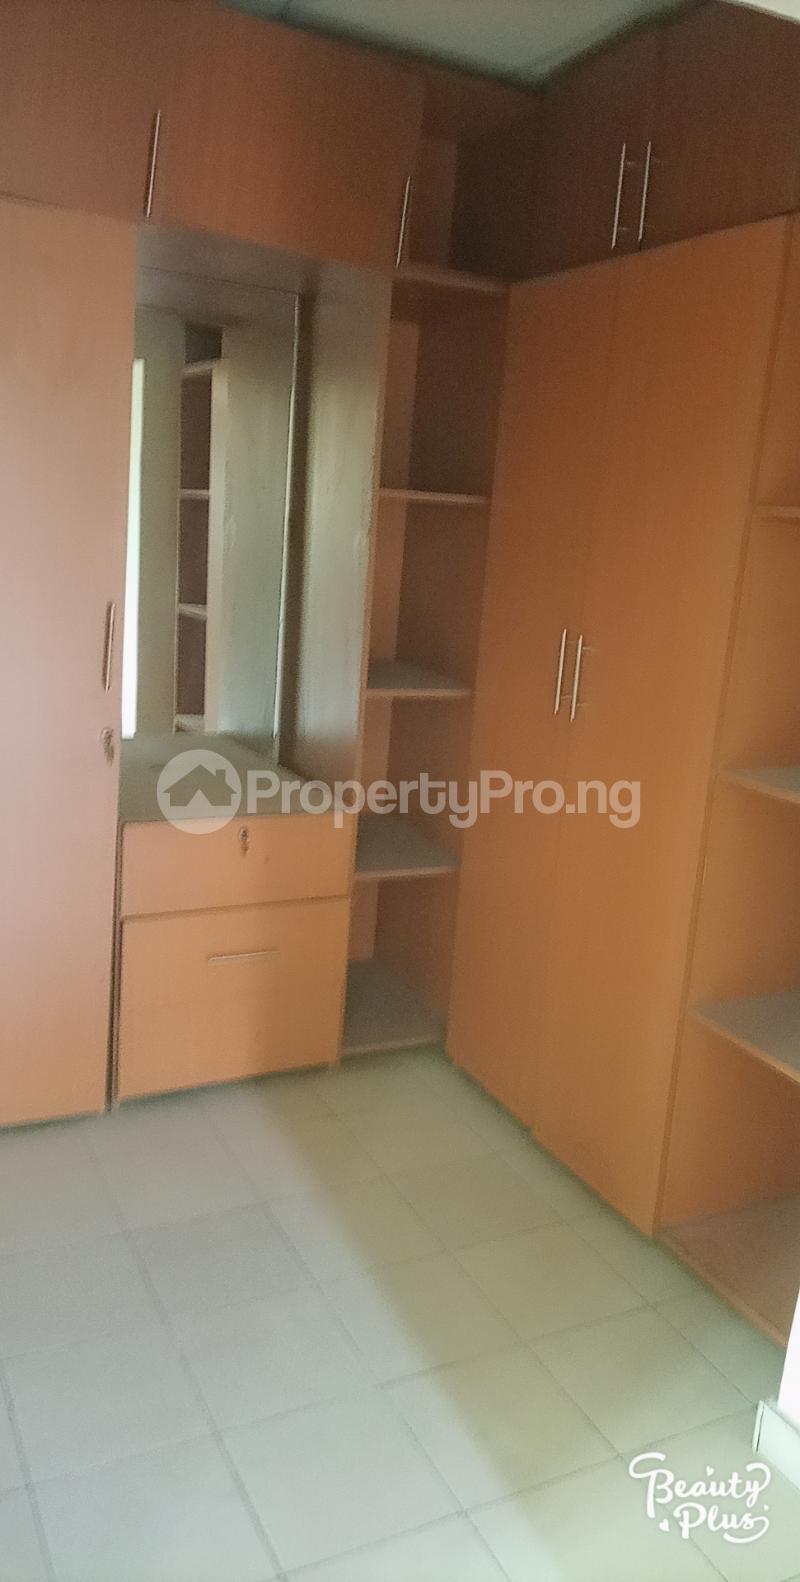 3 bedroom Flat / Apartment for rent Oke Afa isolo. Lagos Mainland Oke-Afa Isolo Lagos - 9